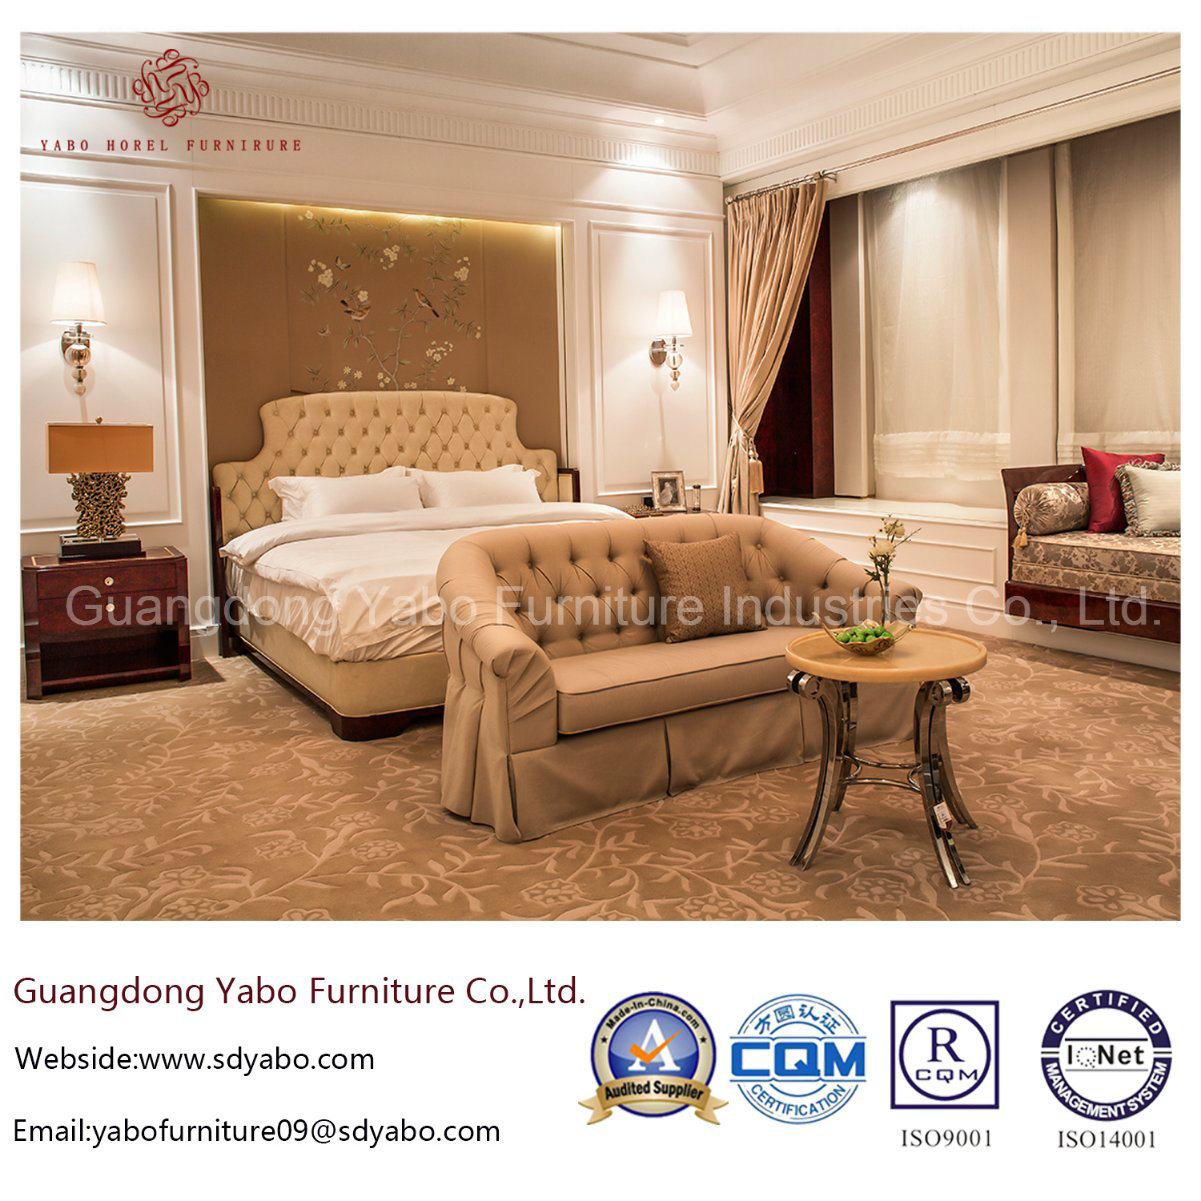 China Fantanstic Hotel Furniture With Modern Bedroom Set Yb O 71 China Living Room Furniture Bedroom Furniture